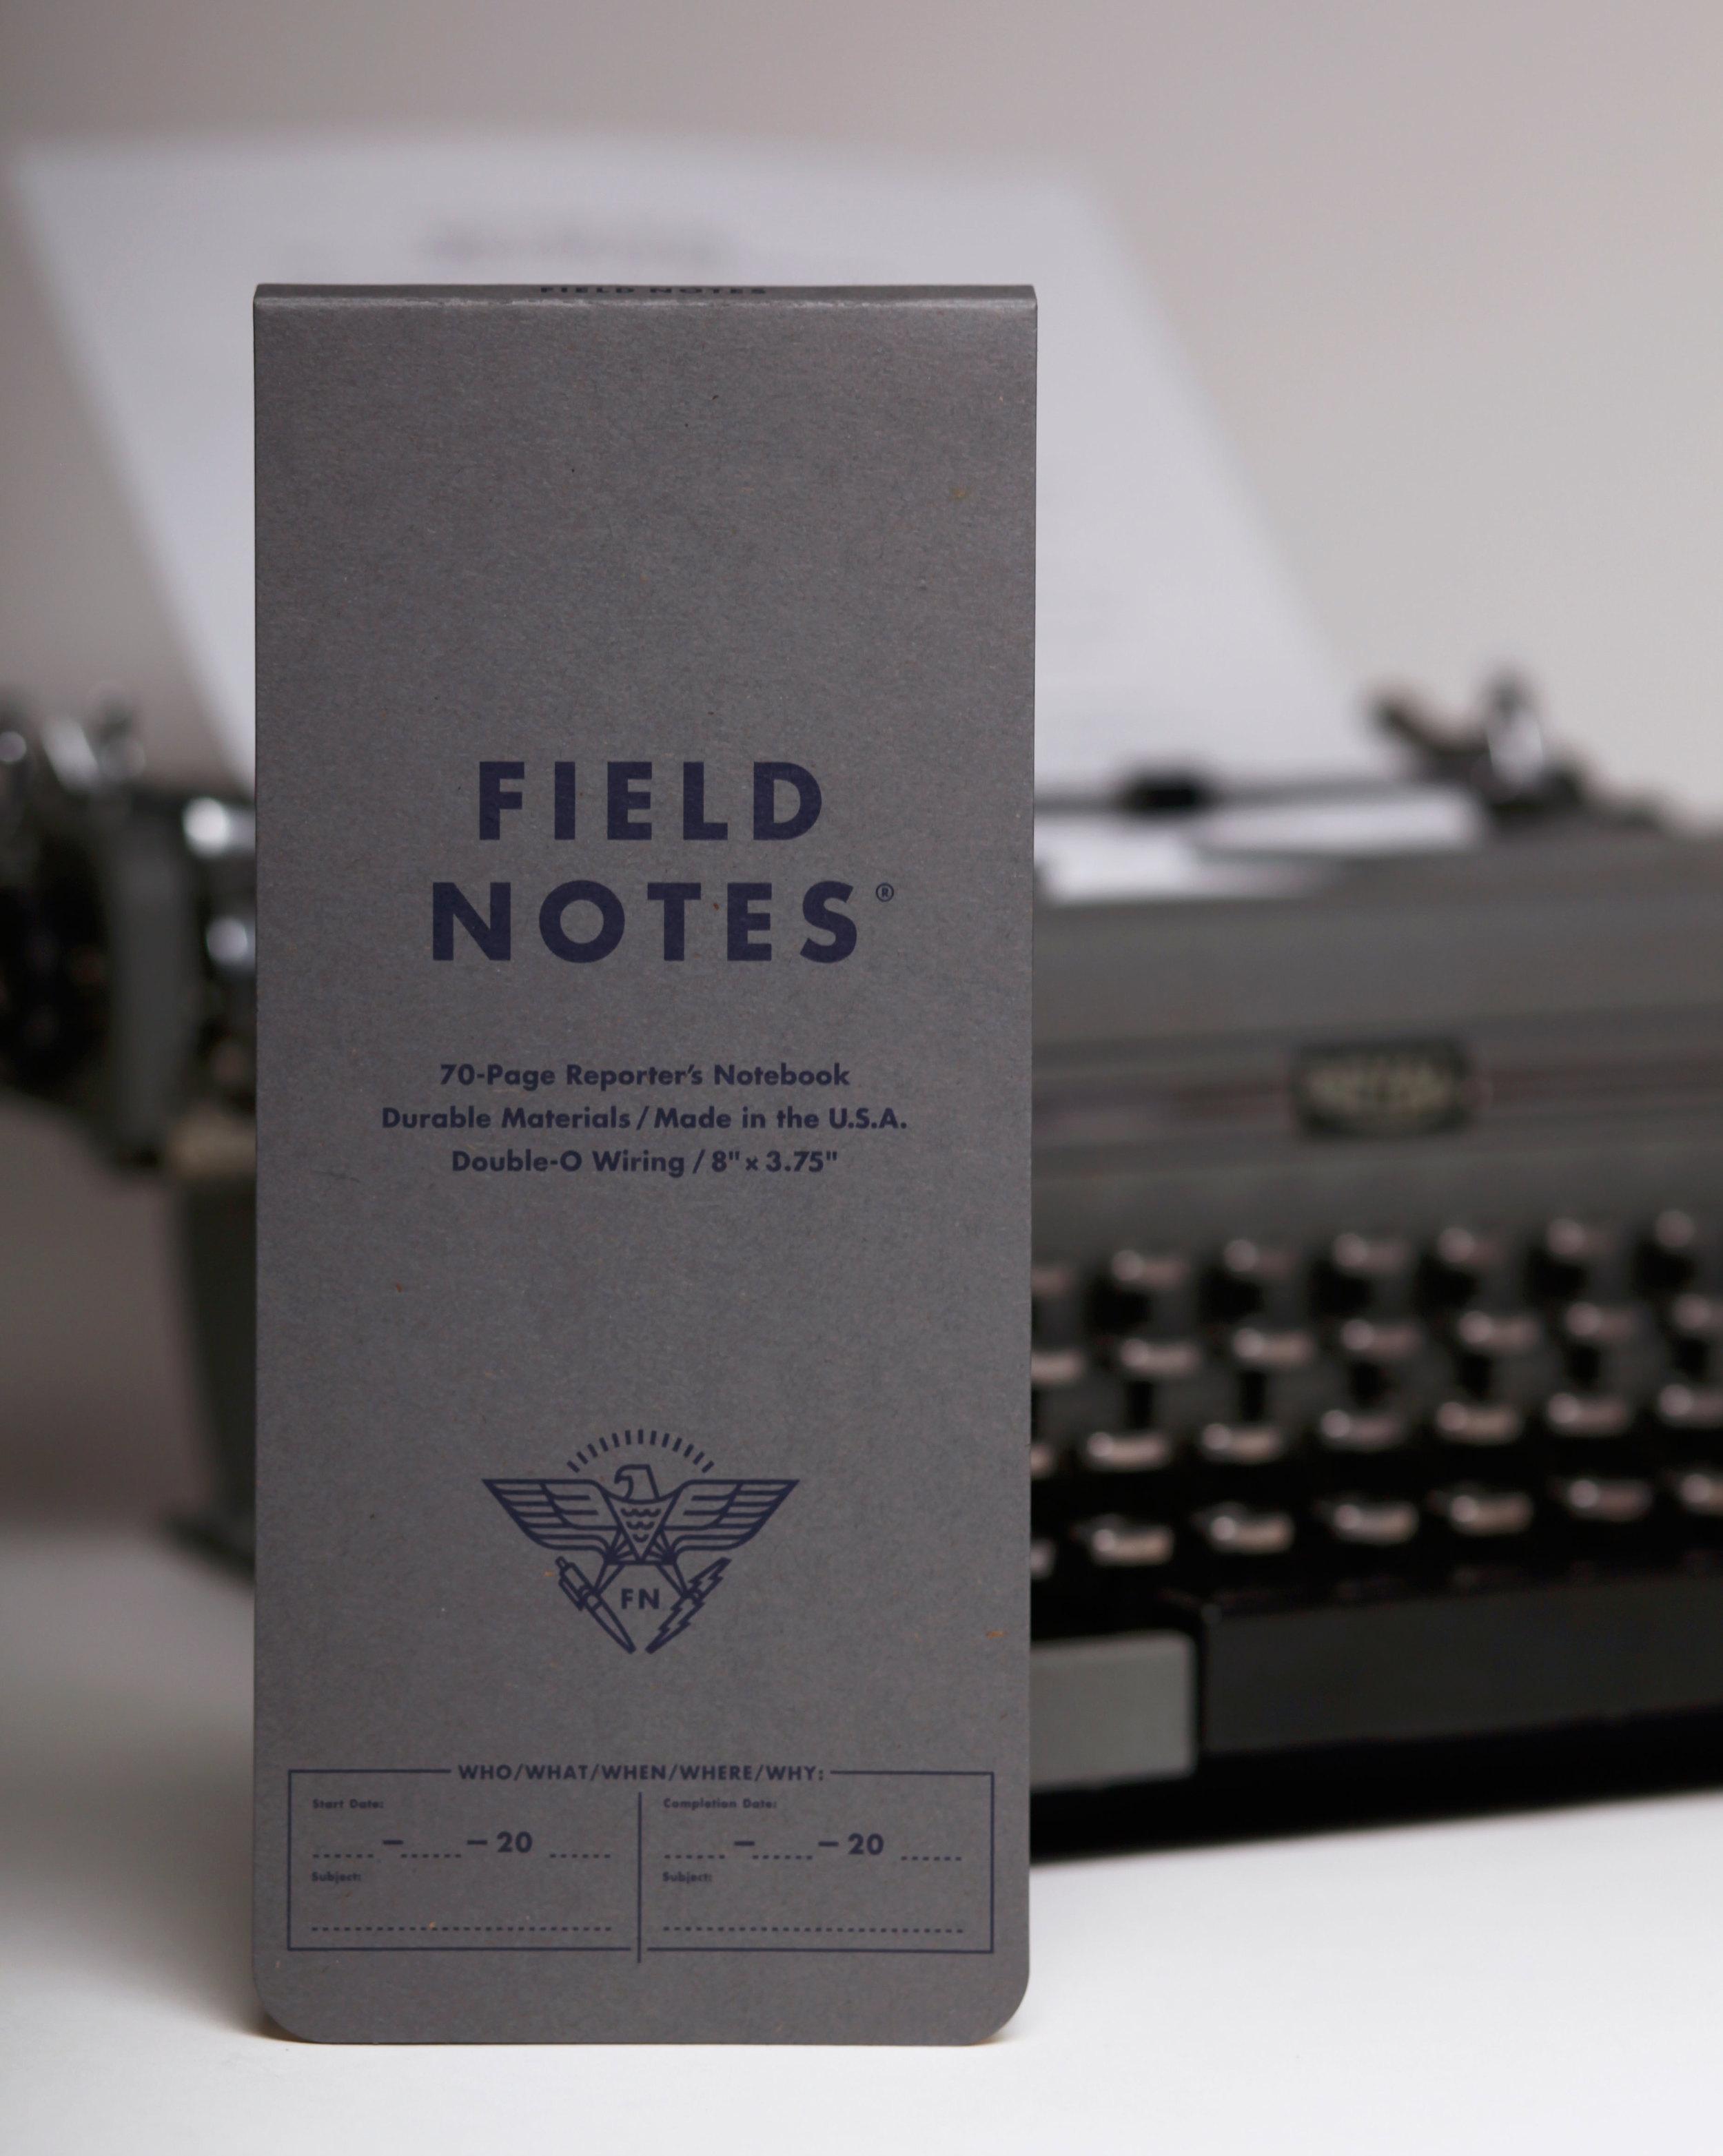 Photo via Field Notes.